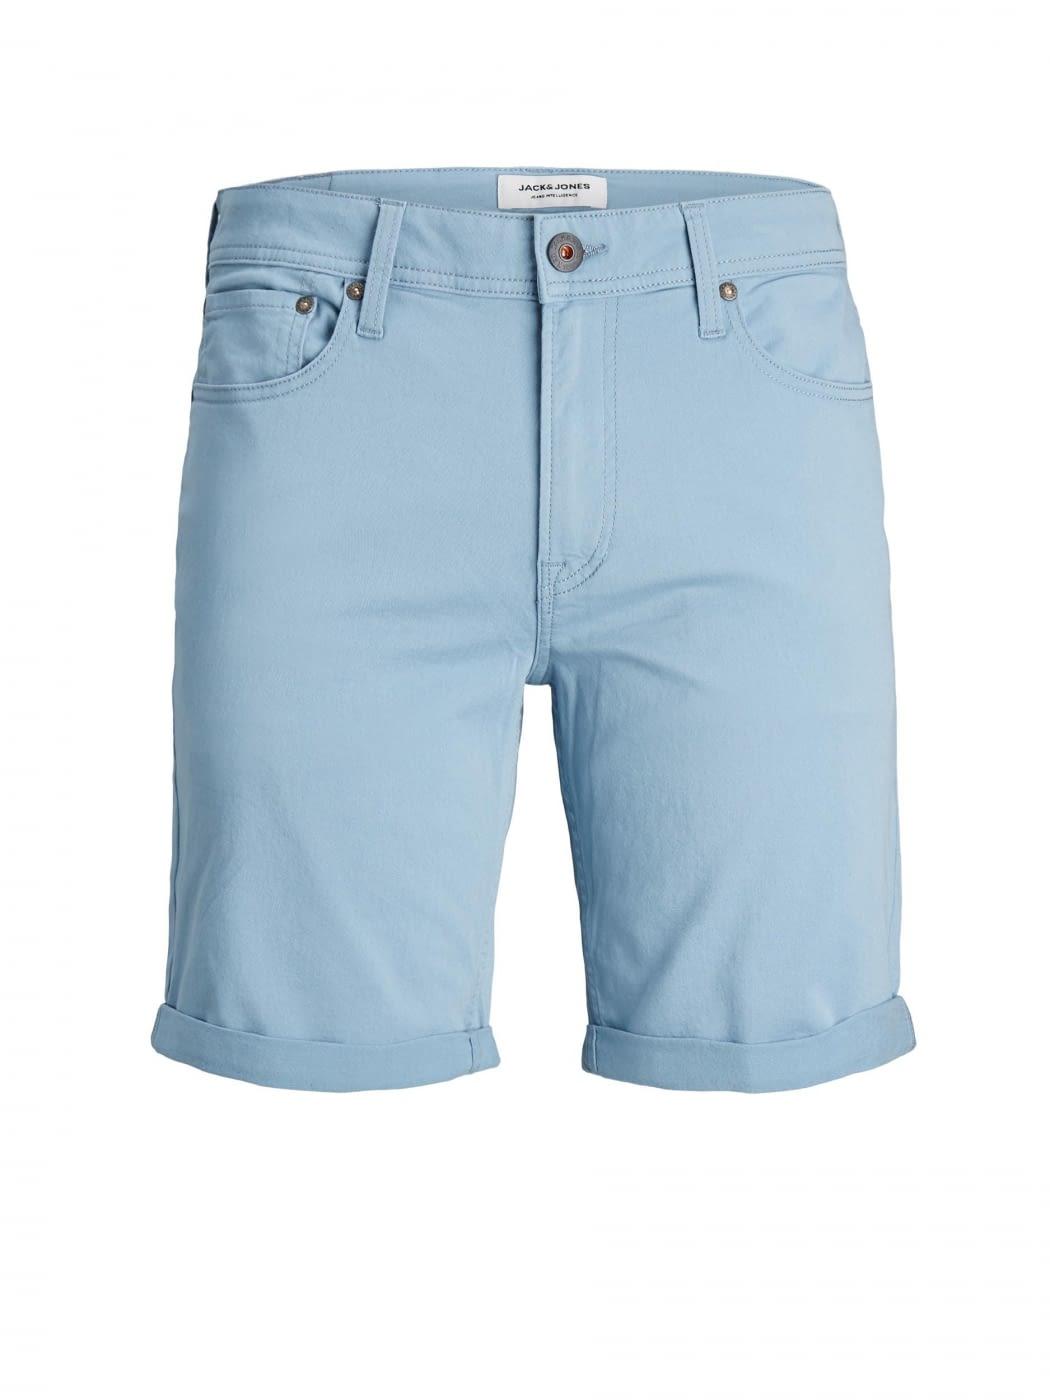 JACK & JONES pantalón corto JJIRICK JJORIGINAL